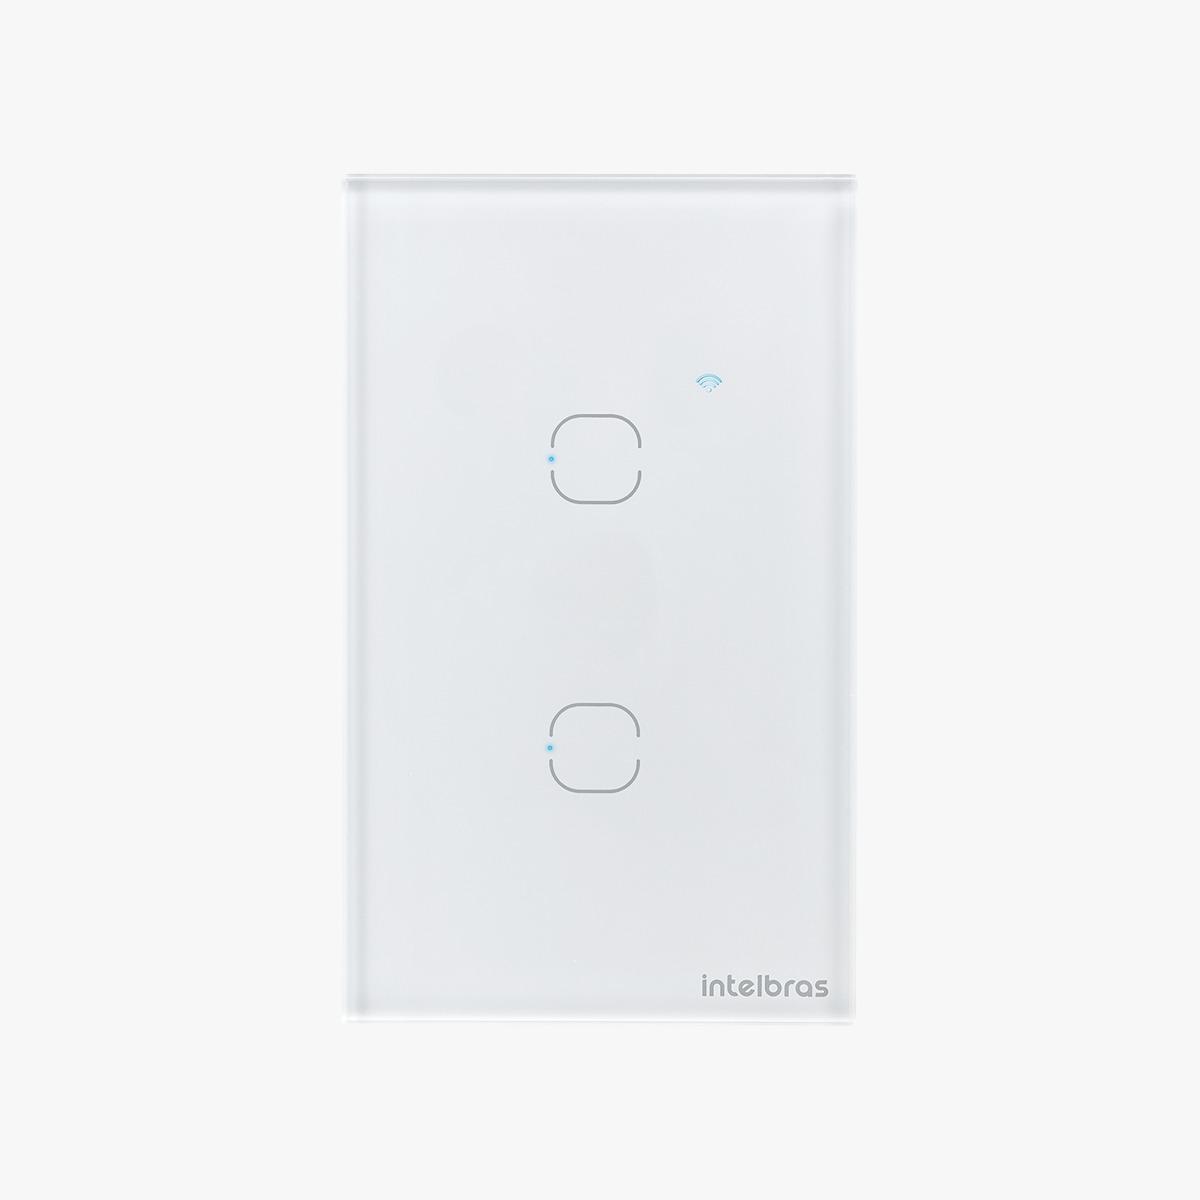 Interruptor touch smart Wi-Fi 2 Botões 4x2 Intelbras EWS 1002 branco - JS Soluções em Segurança